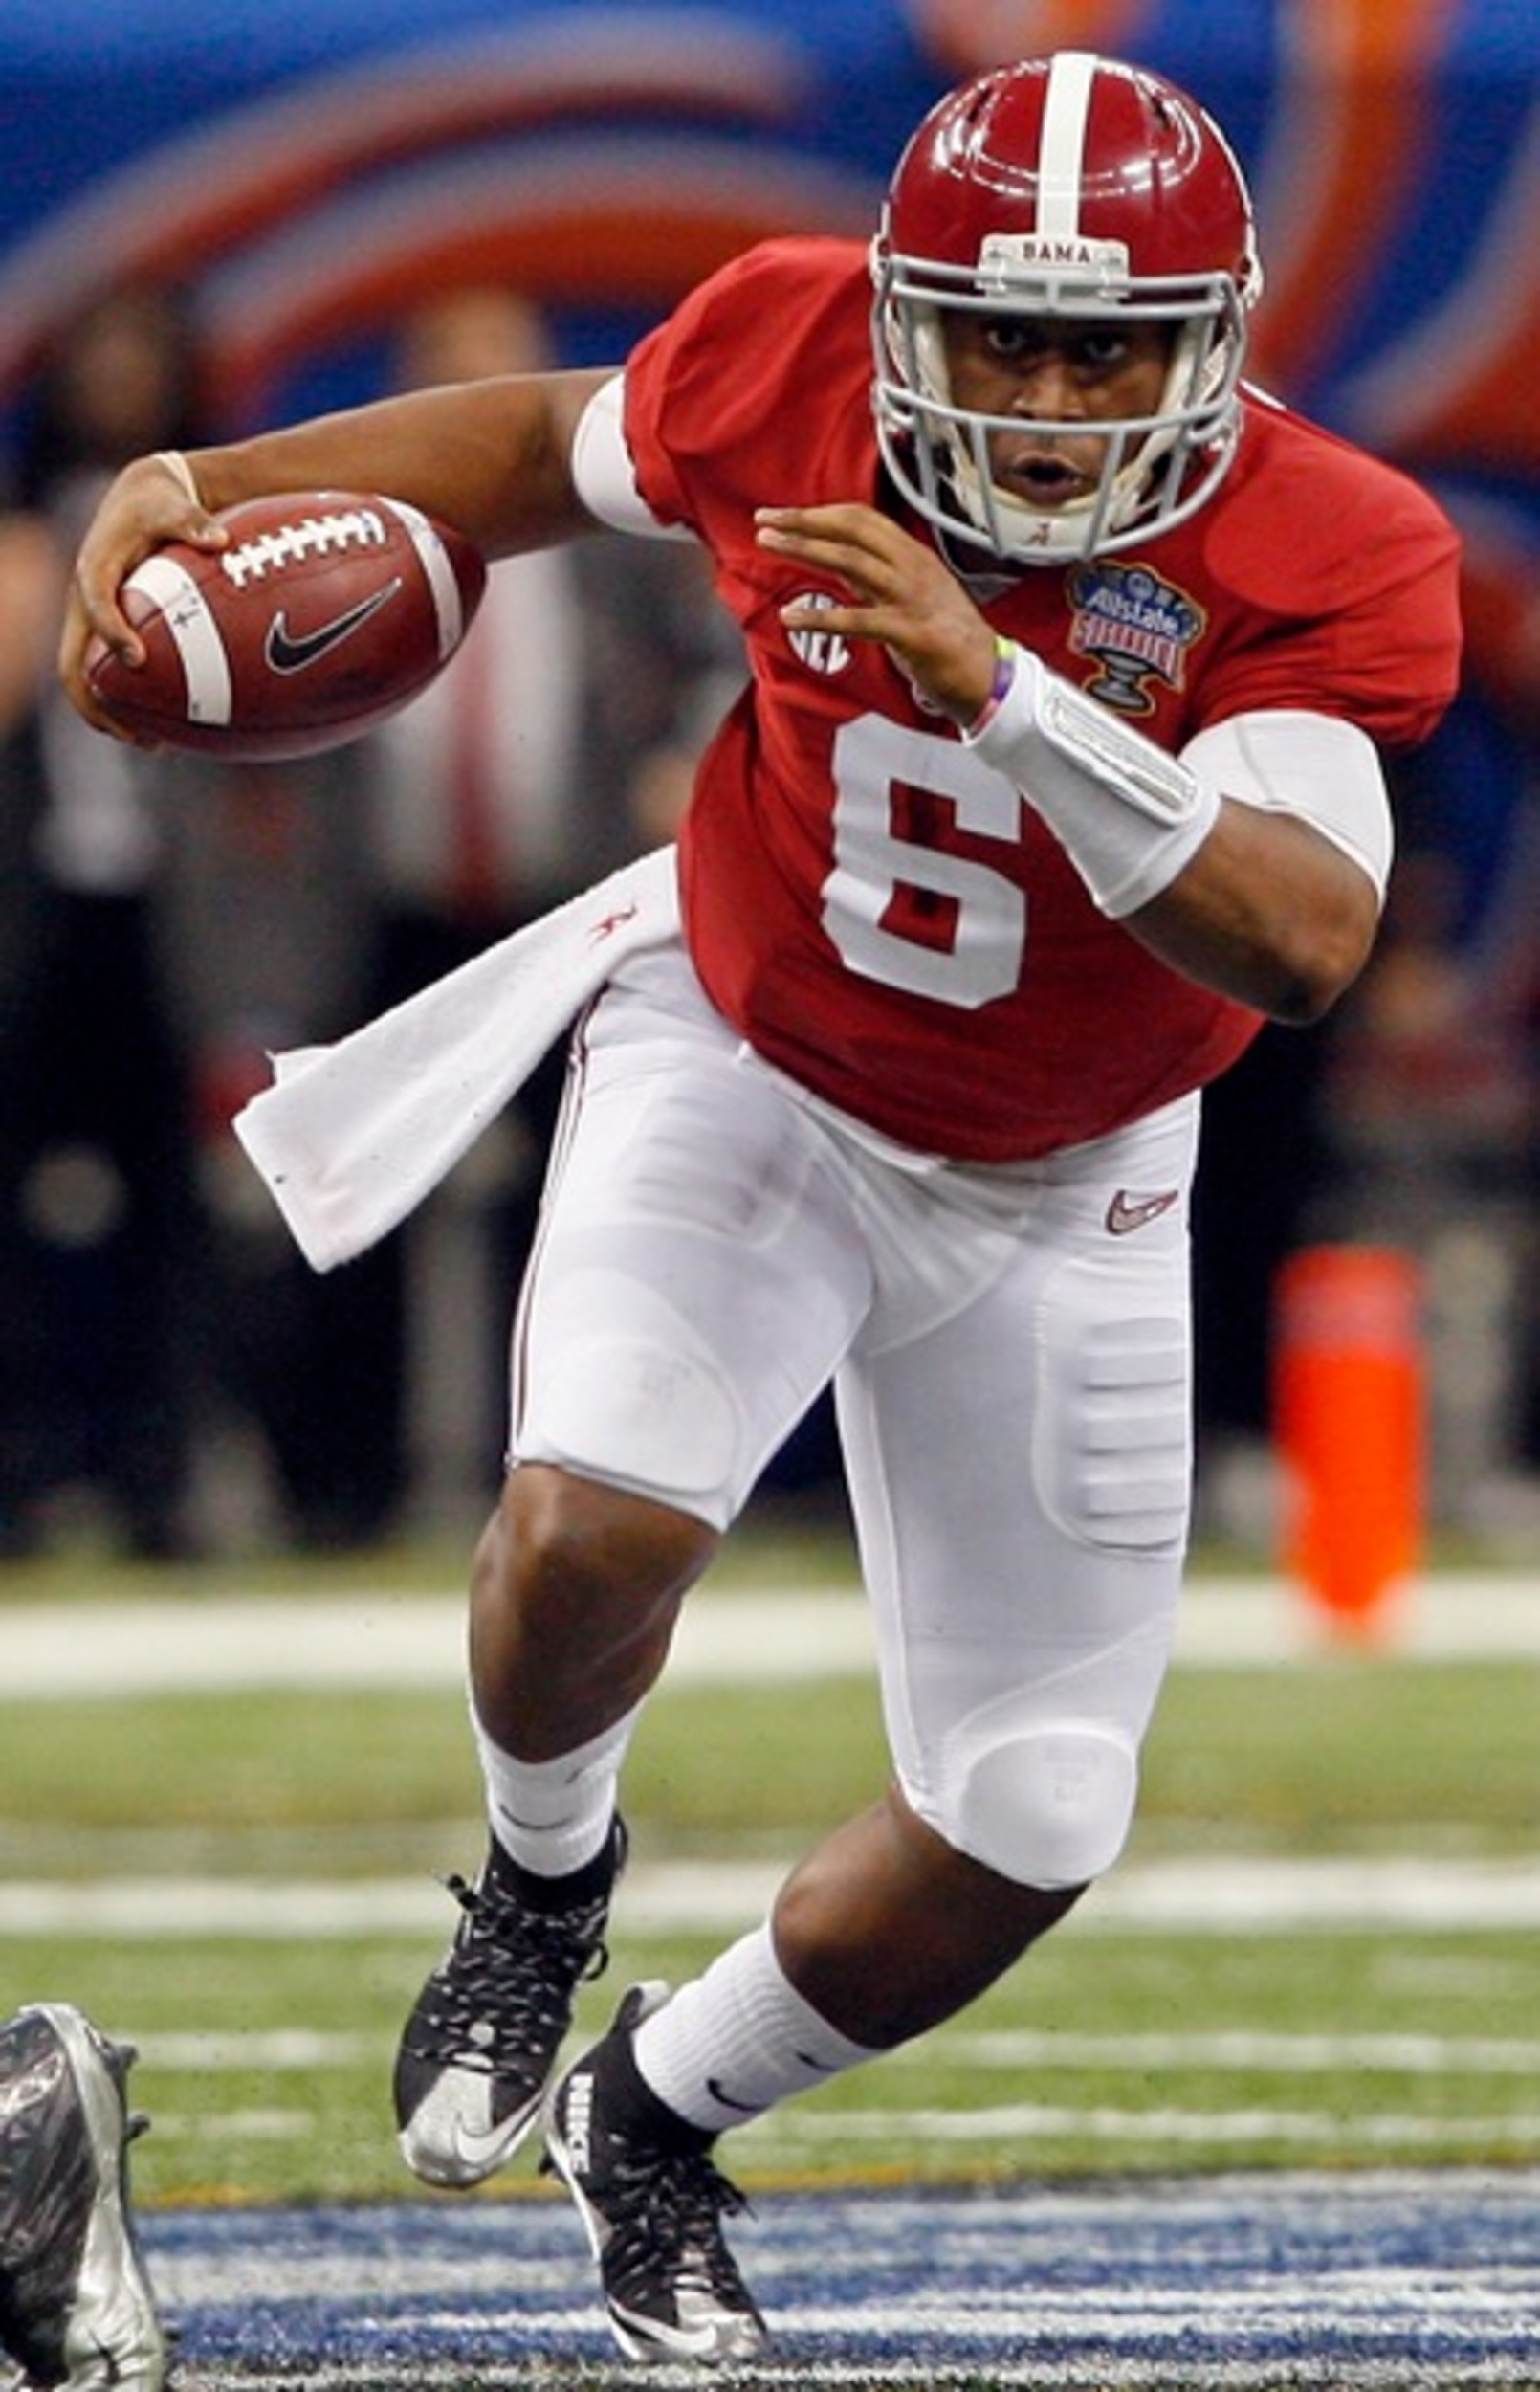 Blake Sims Alabama Crimson Tide Football Jersey-Red